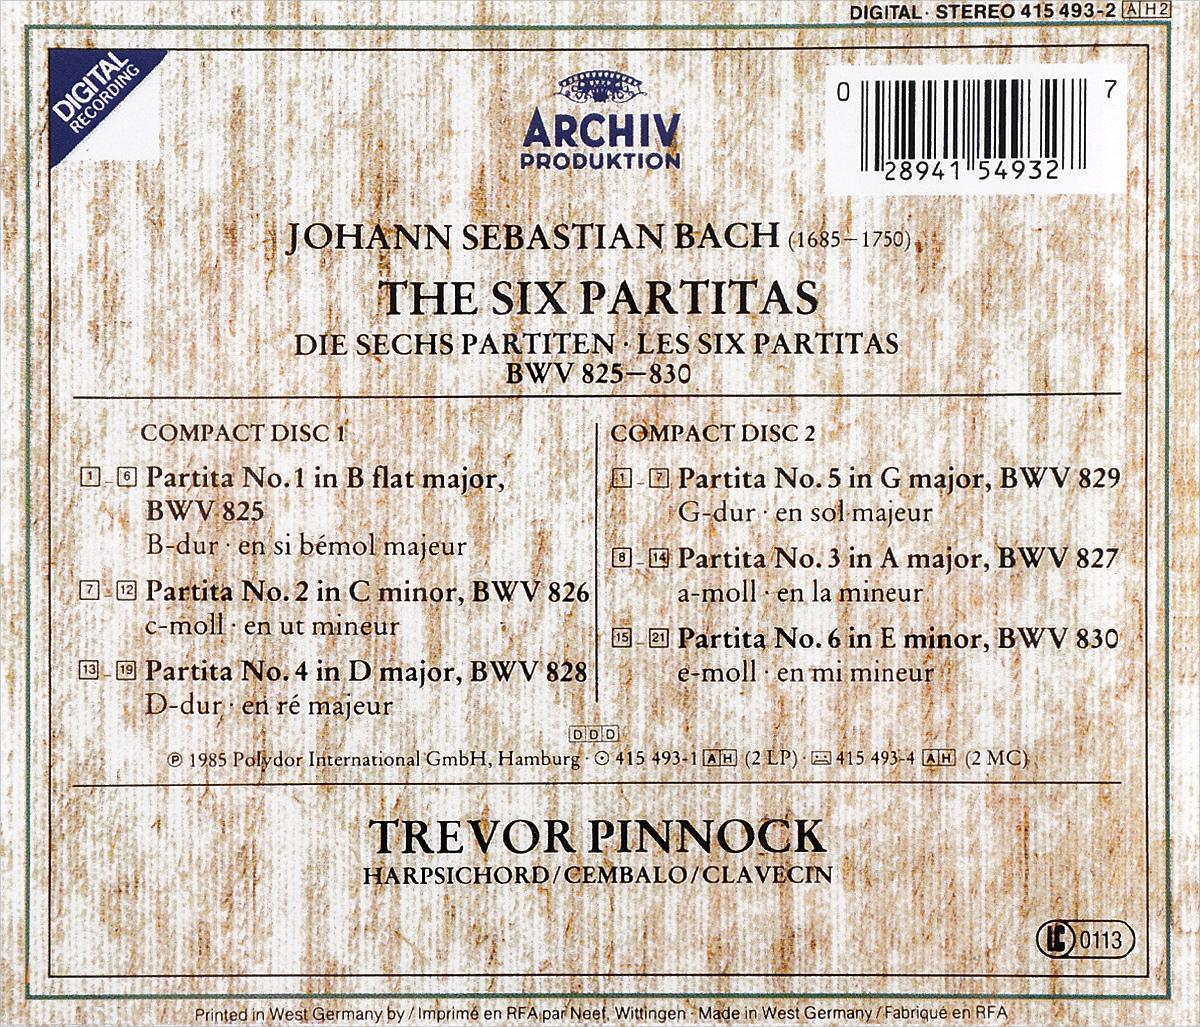 Trevor Pinnock. J. S. Bach. 6 Partitas (2 CD). Тревор Пиннок